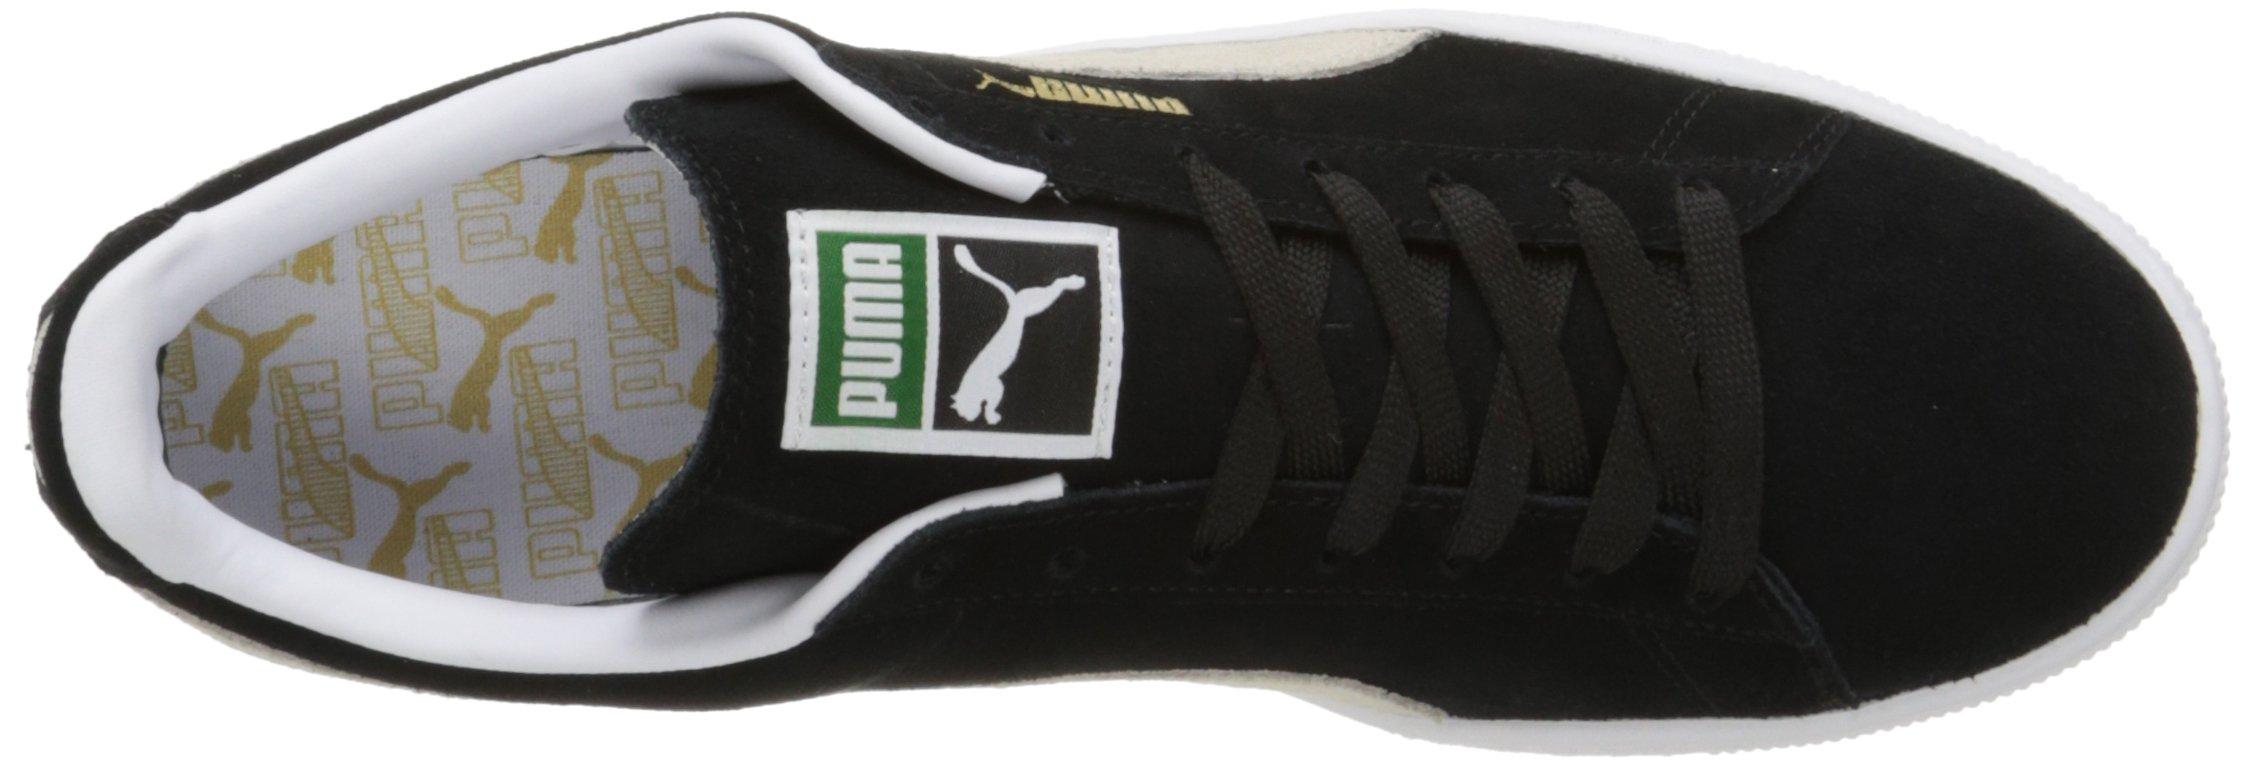 PUMA Suede Classic Sneaker,Black/White,9.5 M US Men's by PUMA (Image #16)